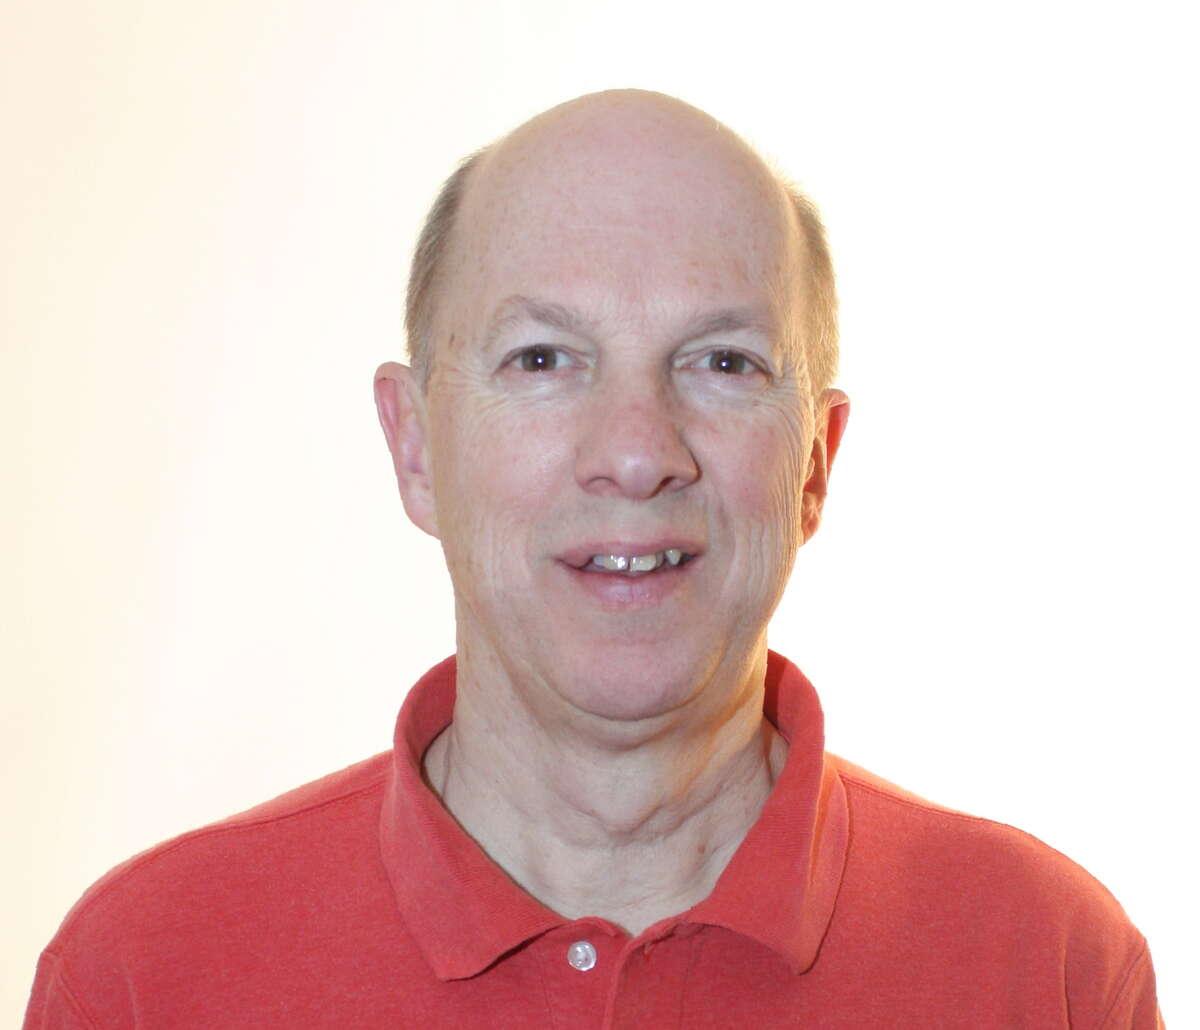 Scotia Deputy Mayor Tom Gifford, a Democrat, defeated Republican Loretta Rigney in the village mayoral race.